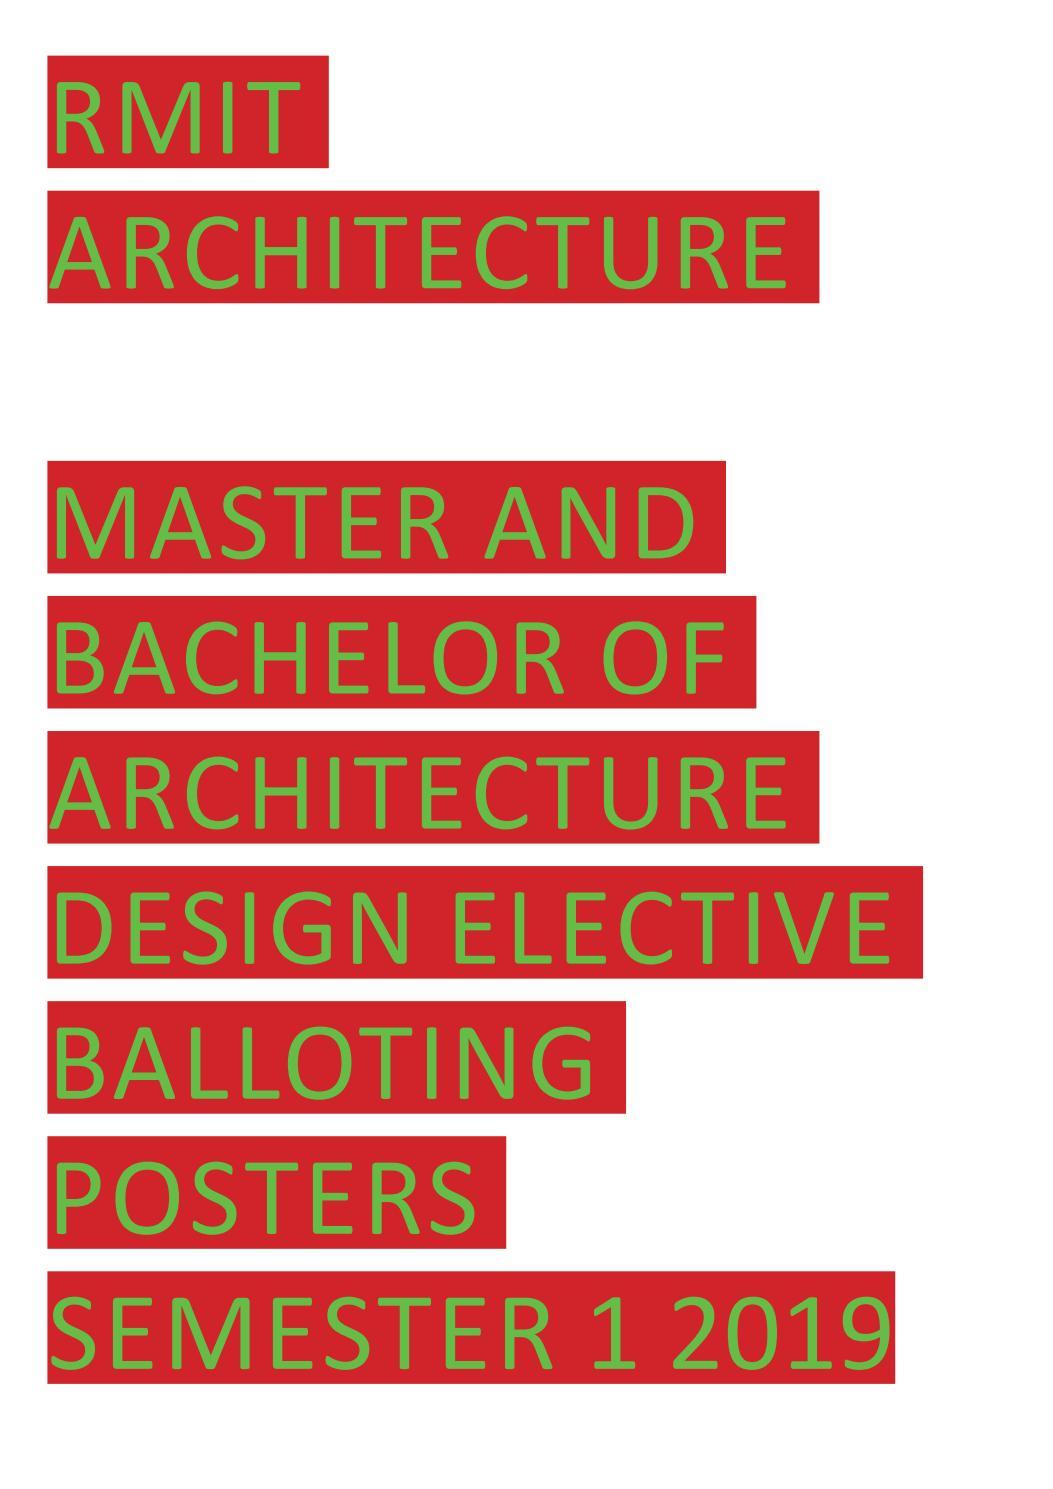 Tremendous Rmit Architecture Design Electives Posters Semester 1 2019 Home Interior And Landscaping Elinuenasavecom